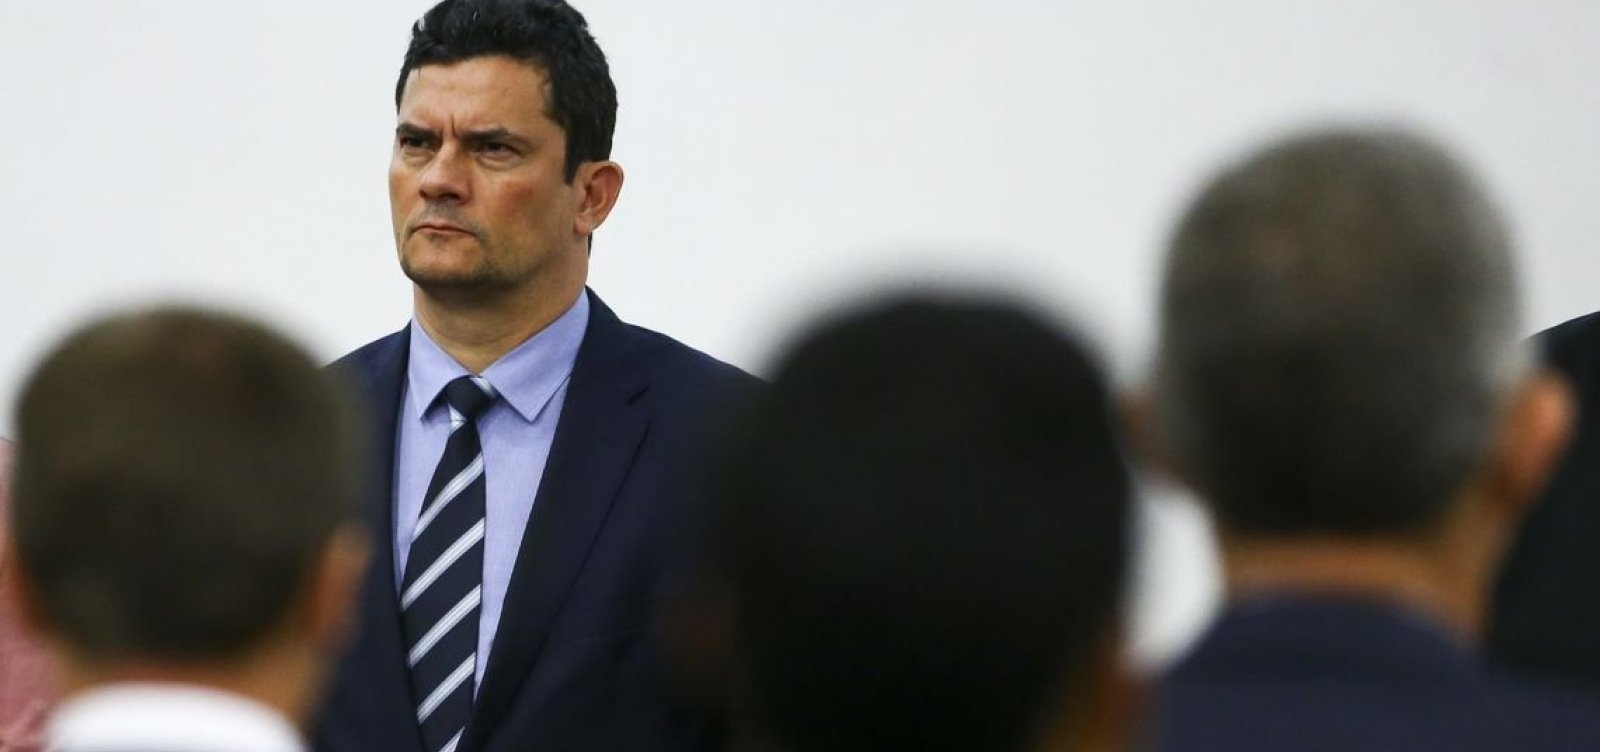 [Documento enviado por Moro contraria discurso de Bolsonaro e defende radares]